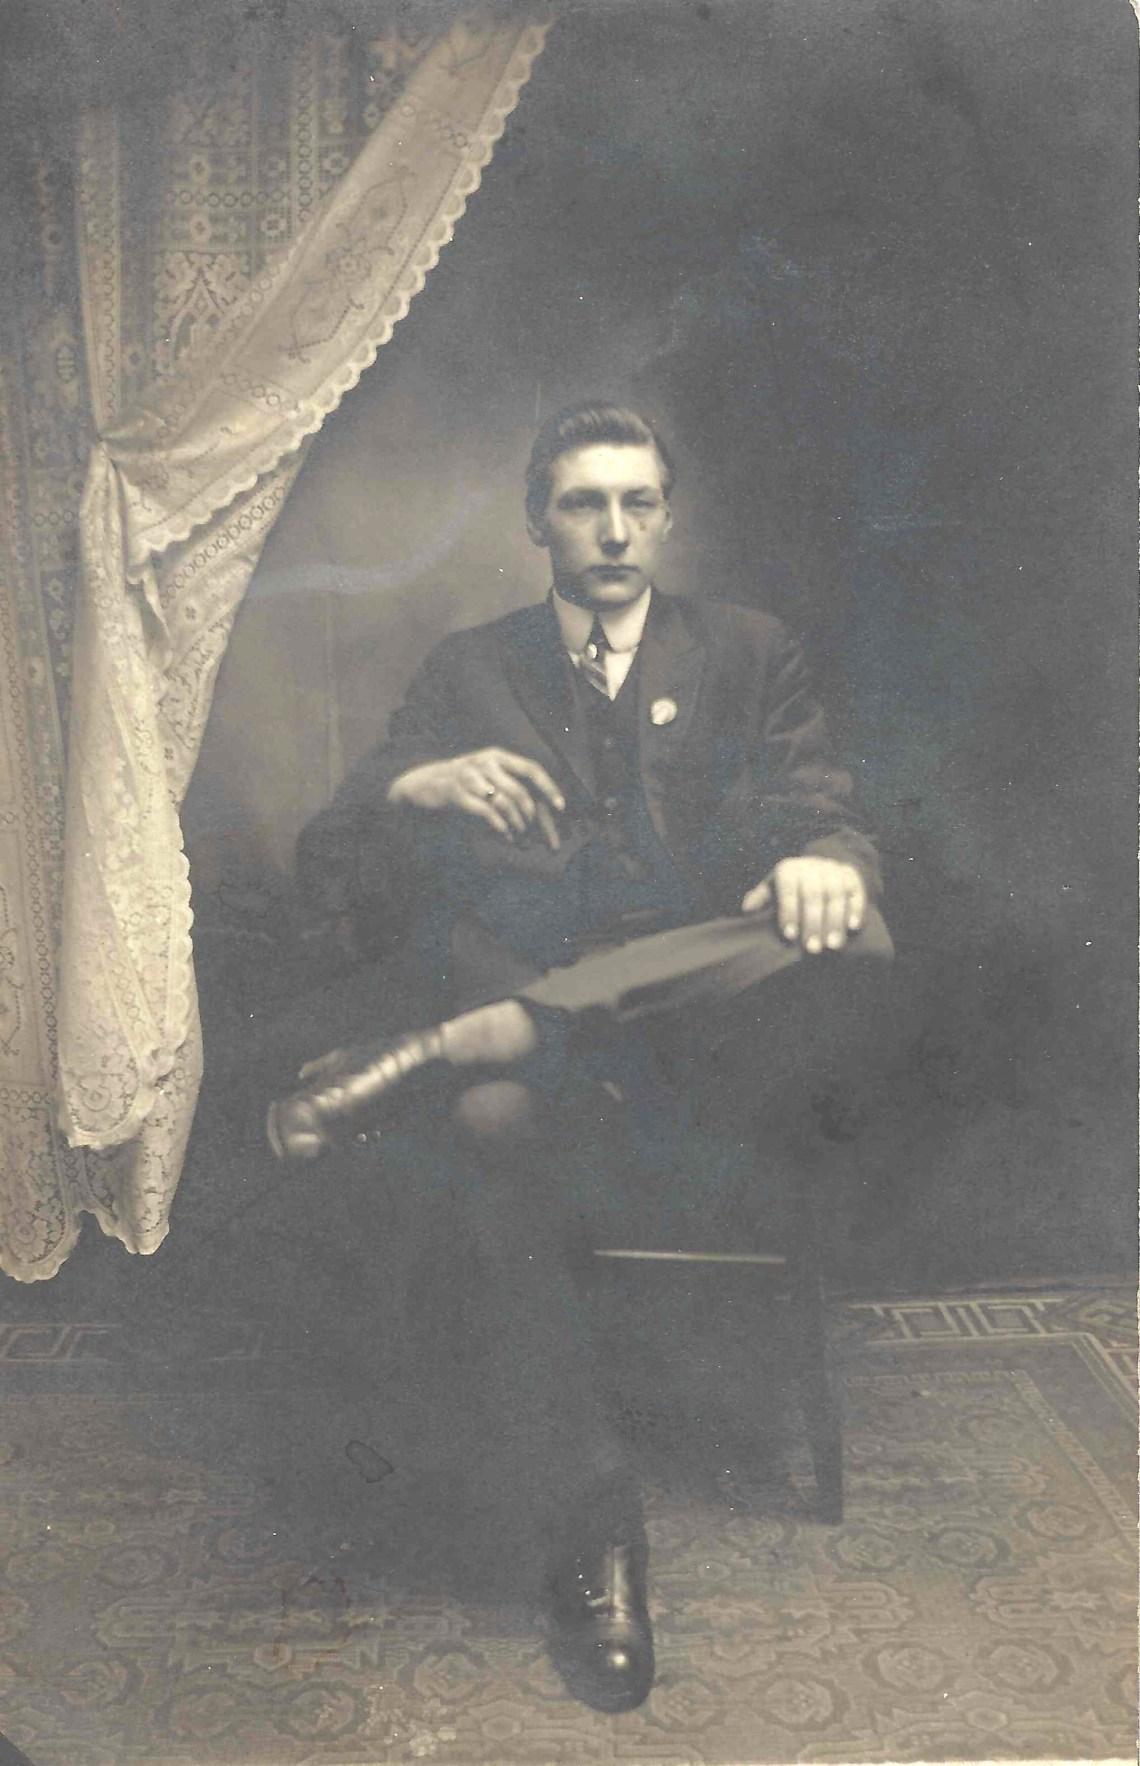 Charles Densberger